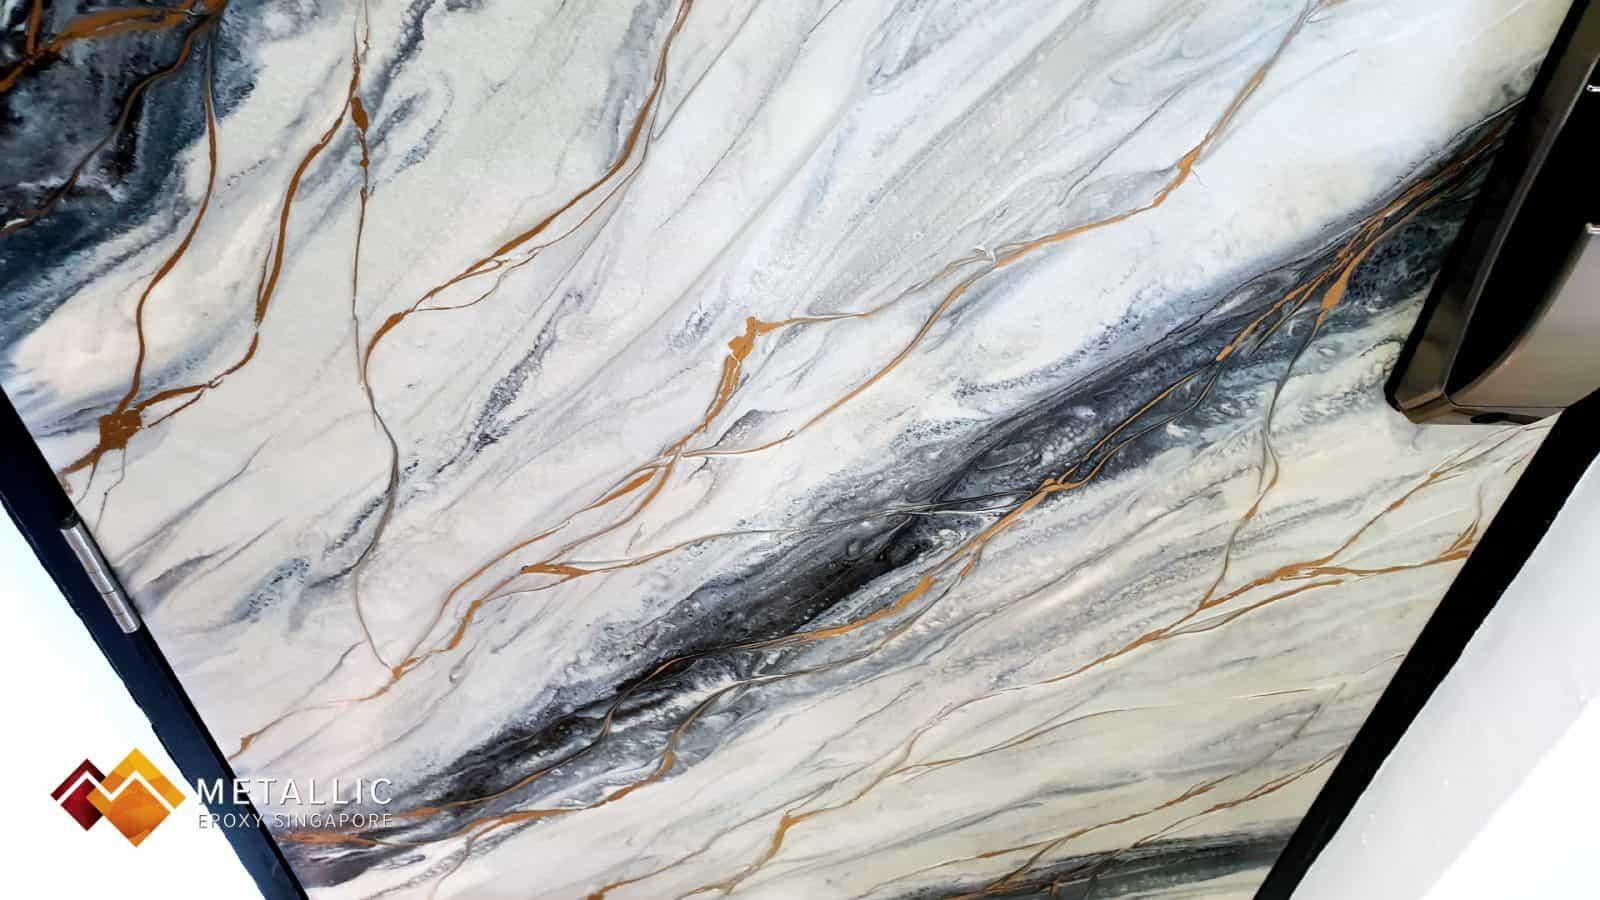 metallic epoxy singapore Grey Silver Marble Door